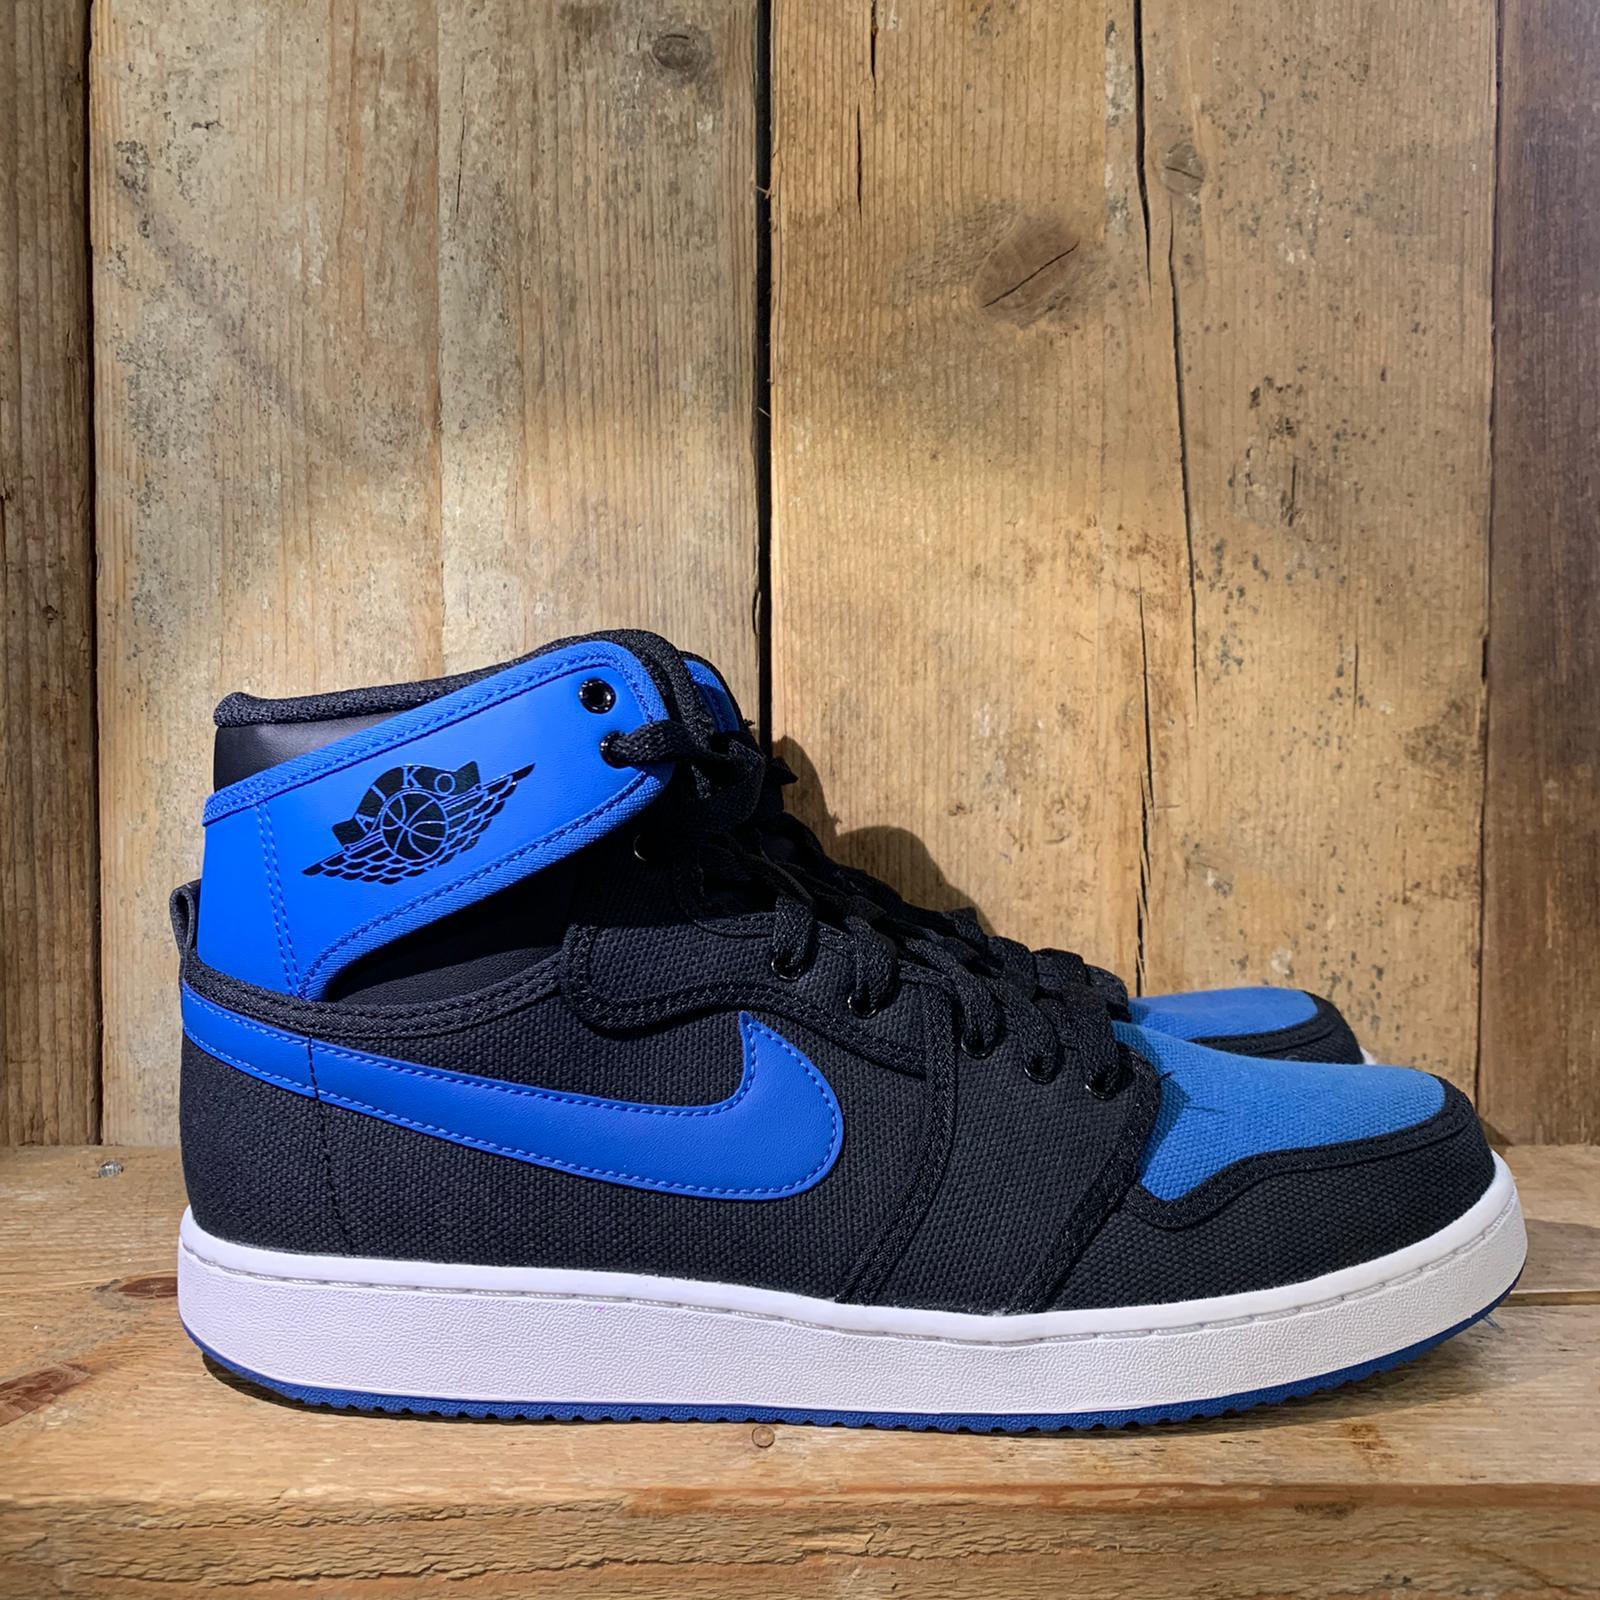 Scarpa Nike Air Jordan 1 KO Royale in Tela Nera e Blu